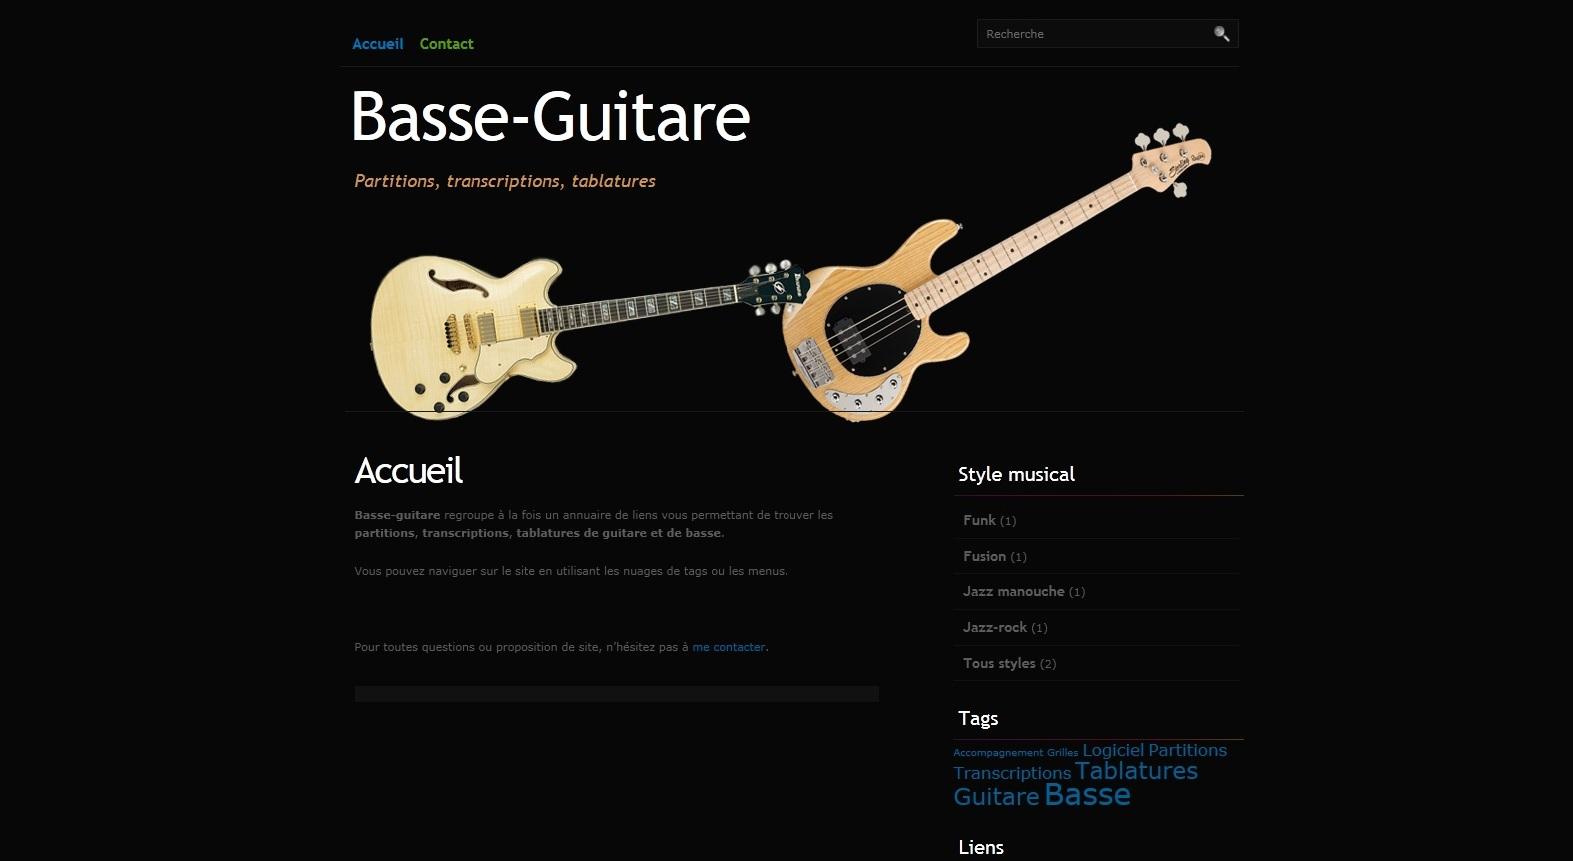 Basse-Guitare